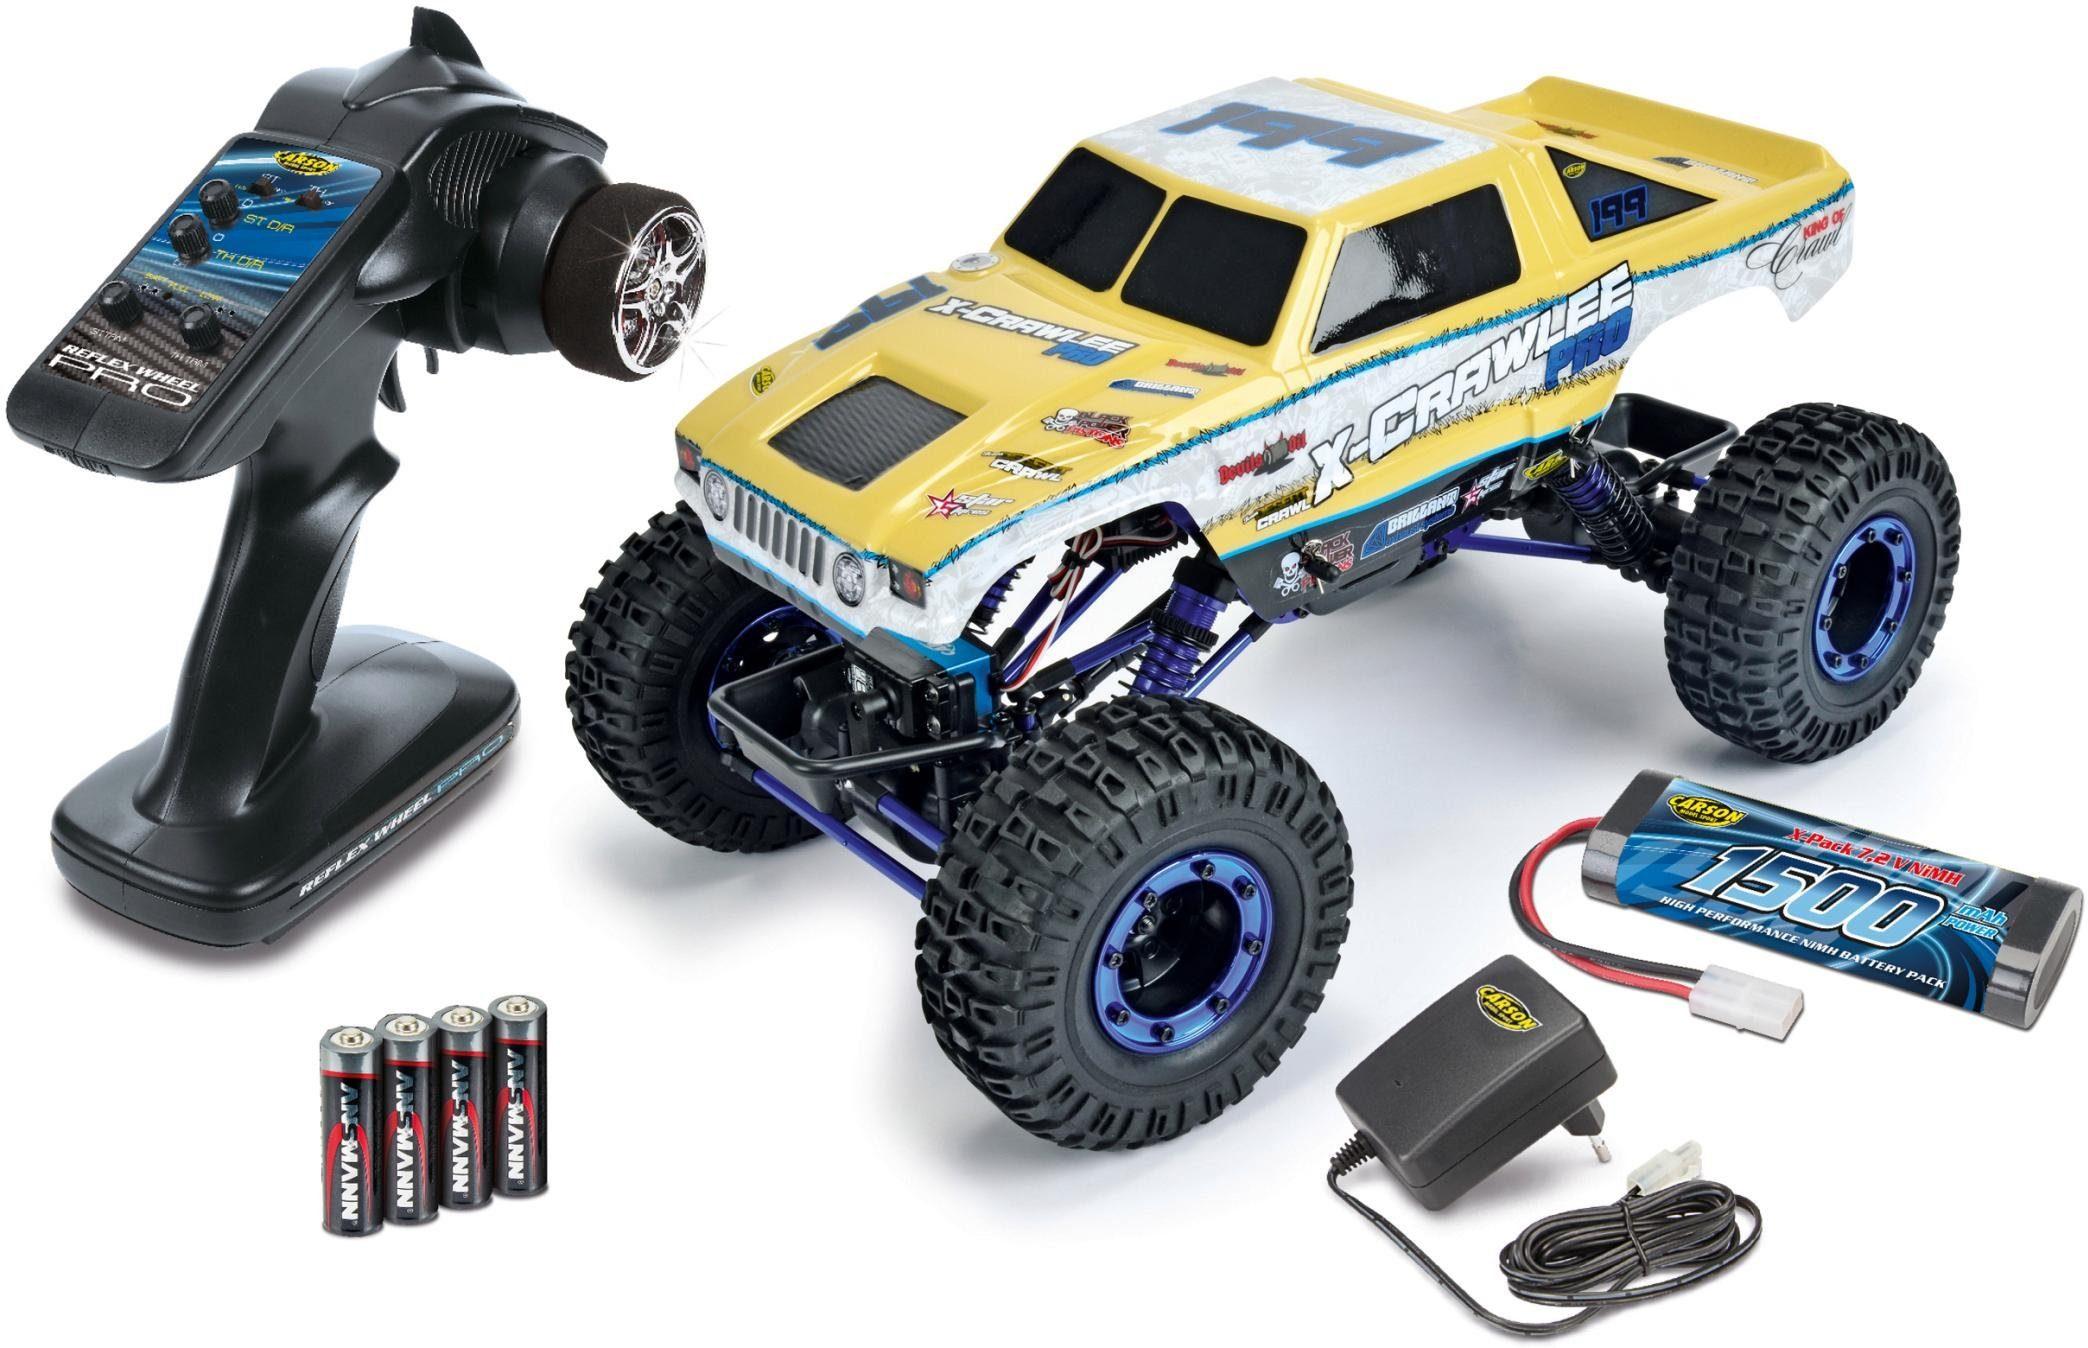 Carson RC-Komplettset, Monstertruck, »X-Crawlee XL, 1:10, RTR«